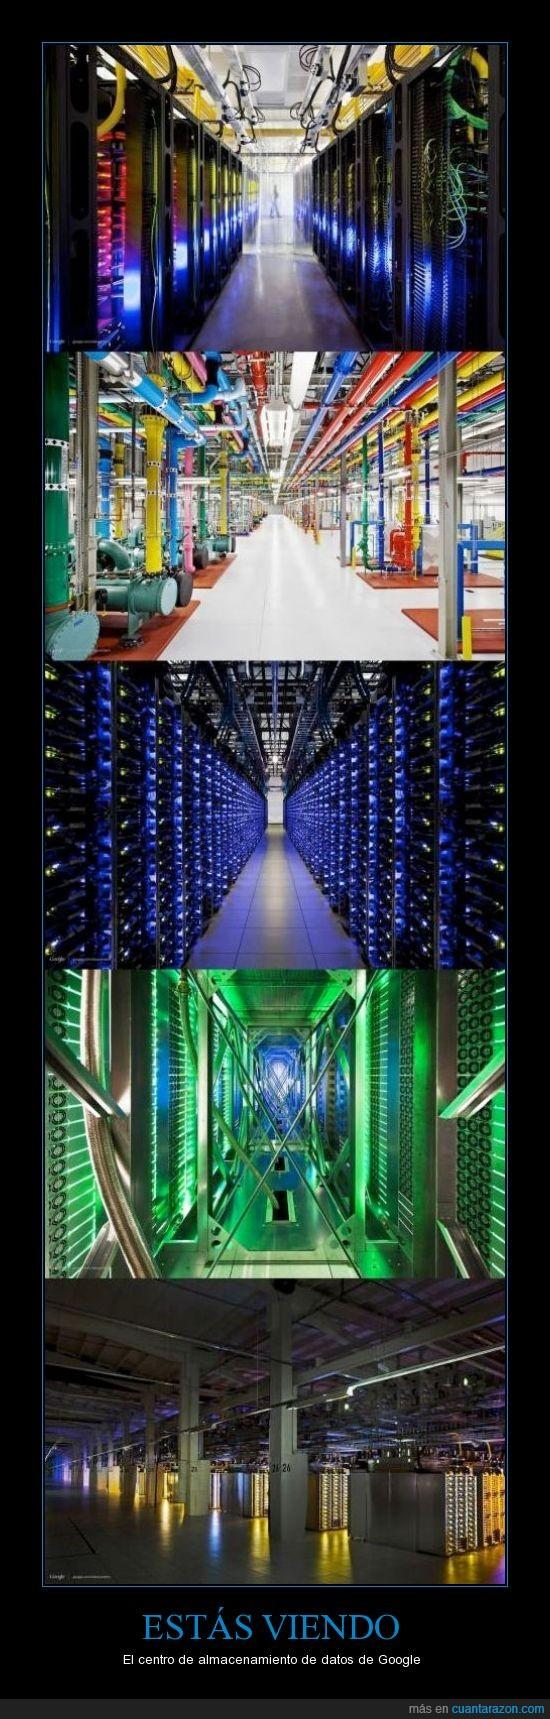 almacenamiento,base,centro,dato,google,luz